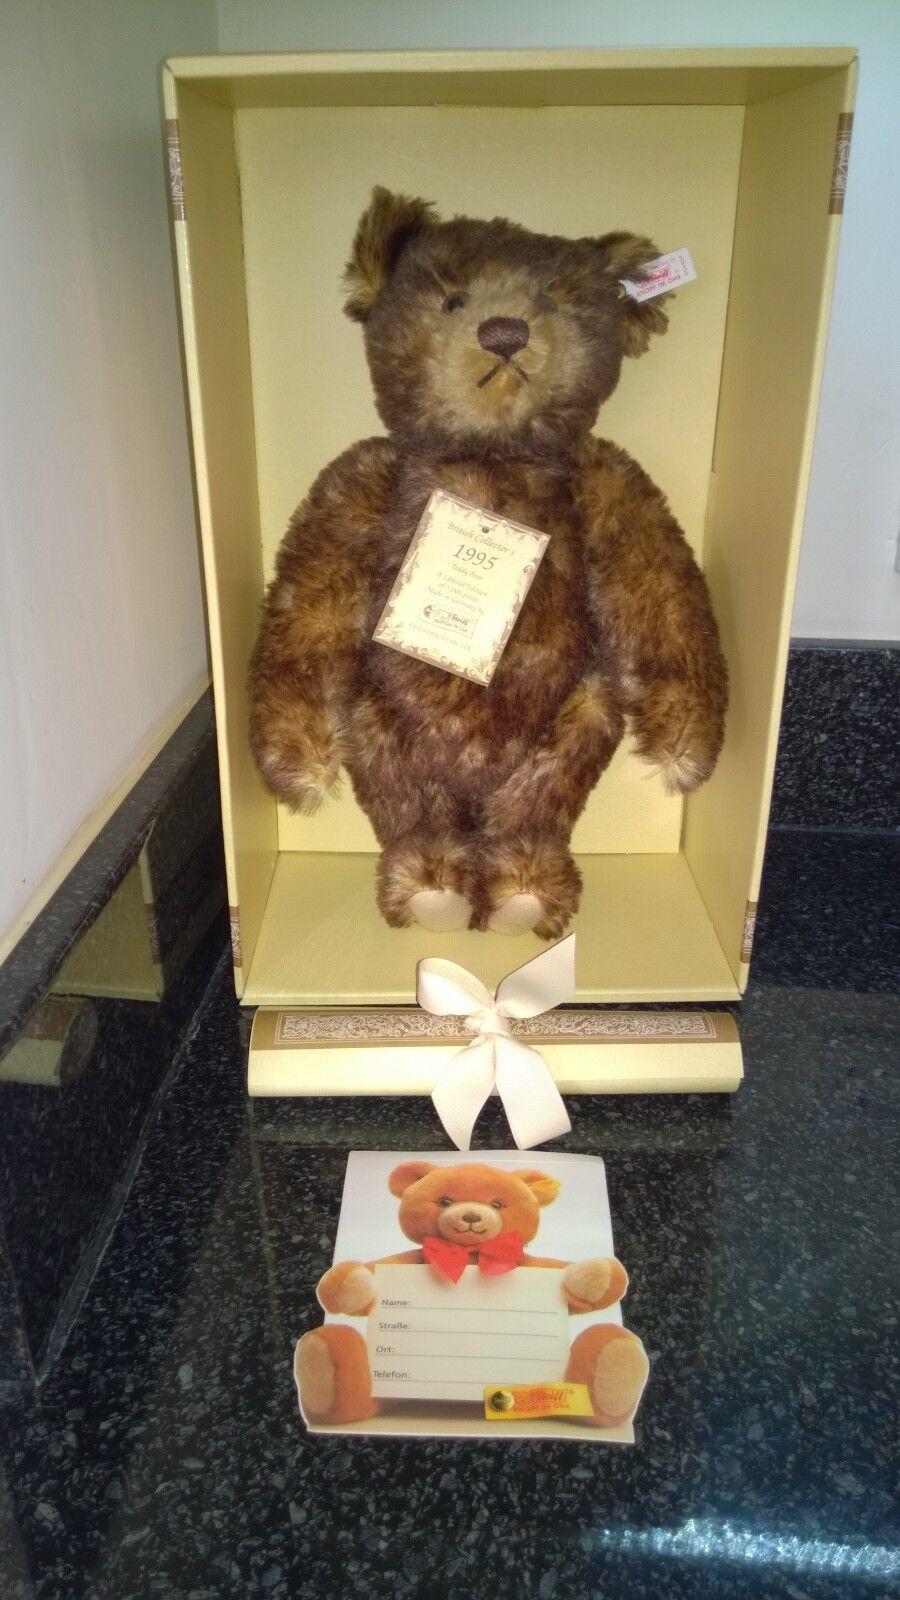 Steiff British Collectors 1995 Teddy Bear Brown Tipped 35 EAN 654404 Ltd Boxed